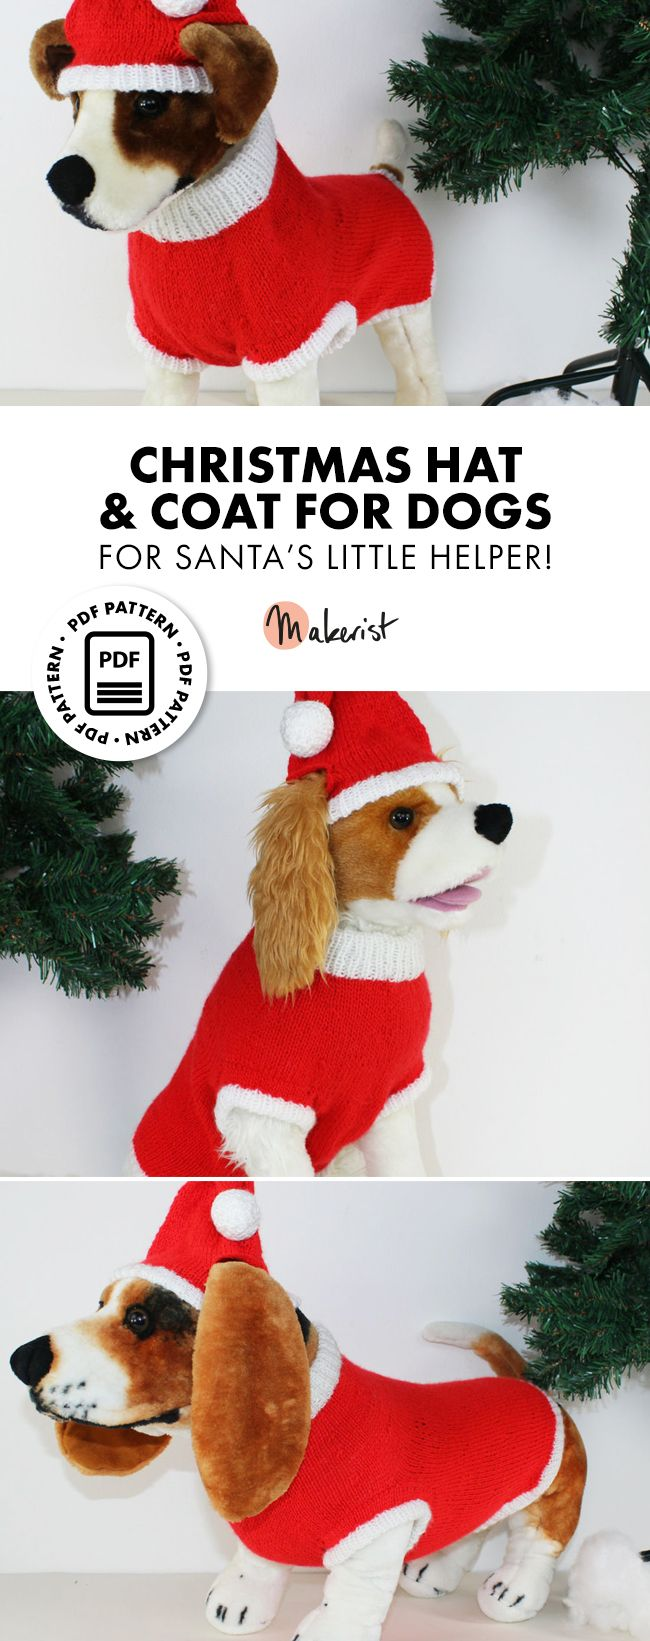 Dog Christmas Santa Hat And Coat Circular Christmas Dog Costume Dog Clothes Patterns Fun Christmas Outfits